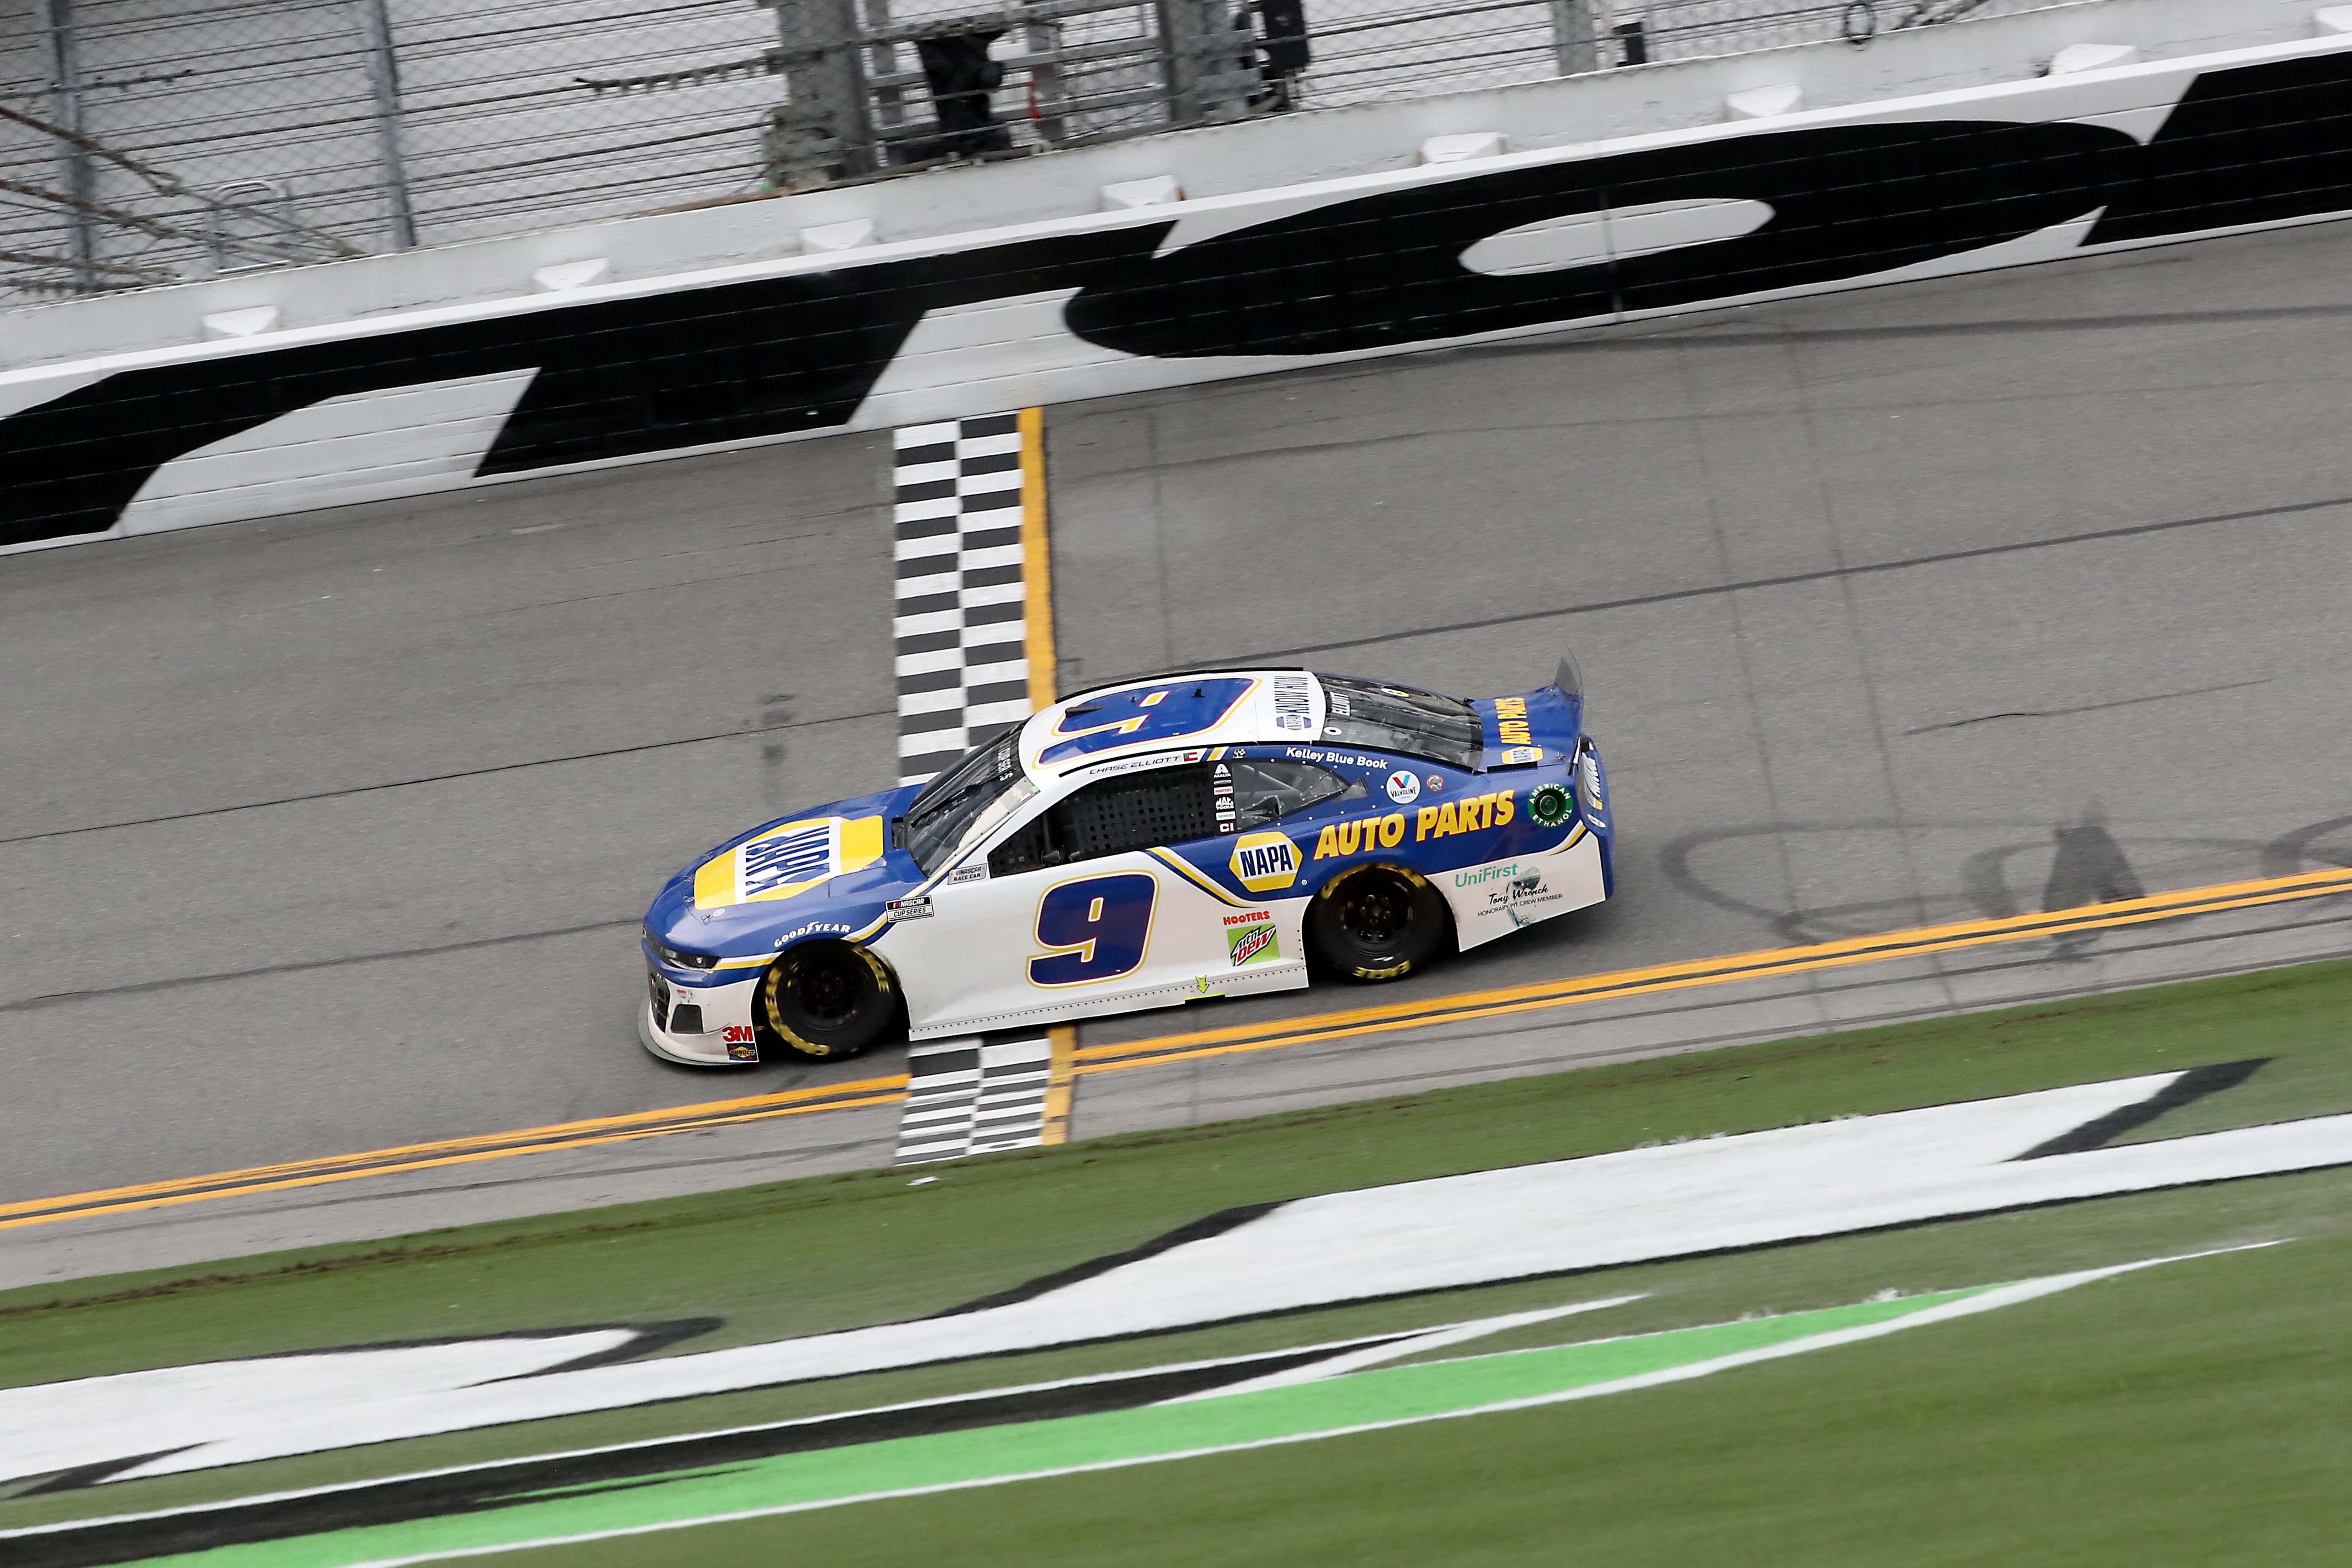 NASCAR fines Hendrick Motorsports $100,000 - Racing News